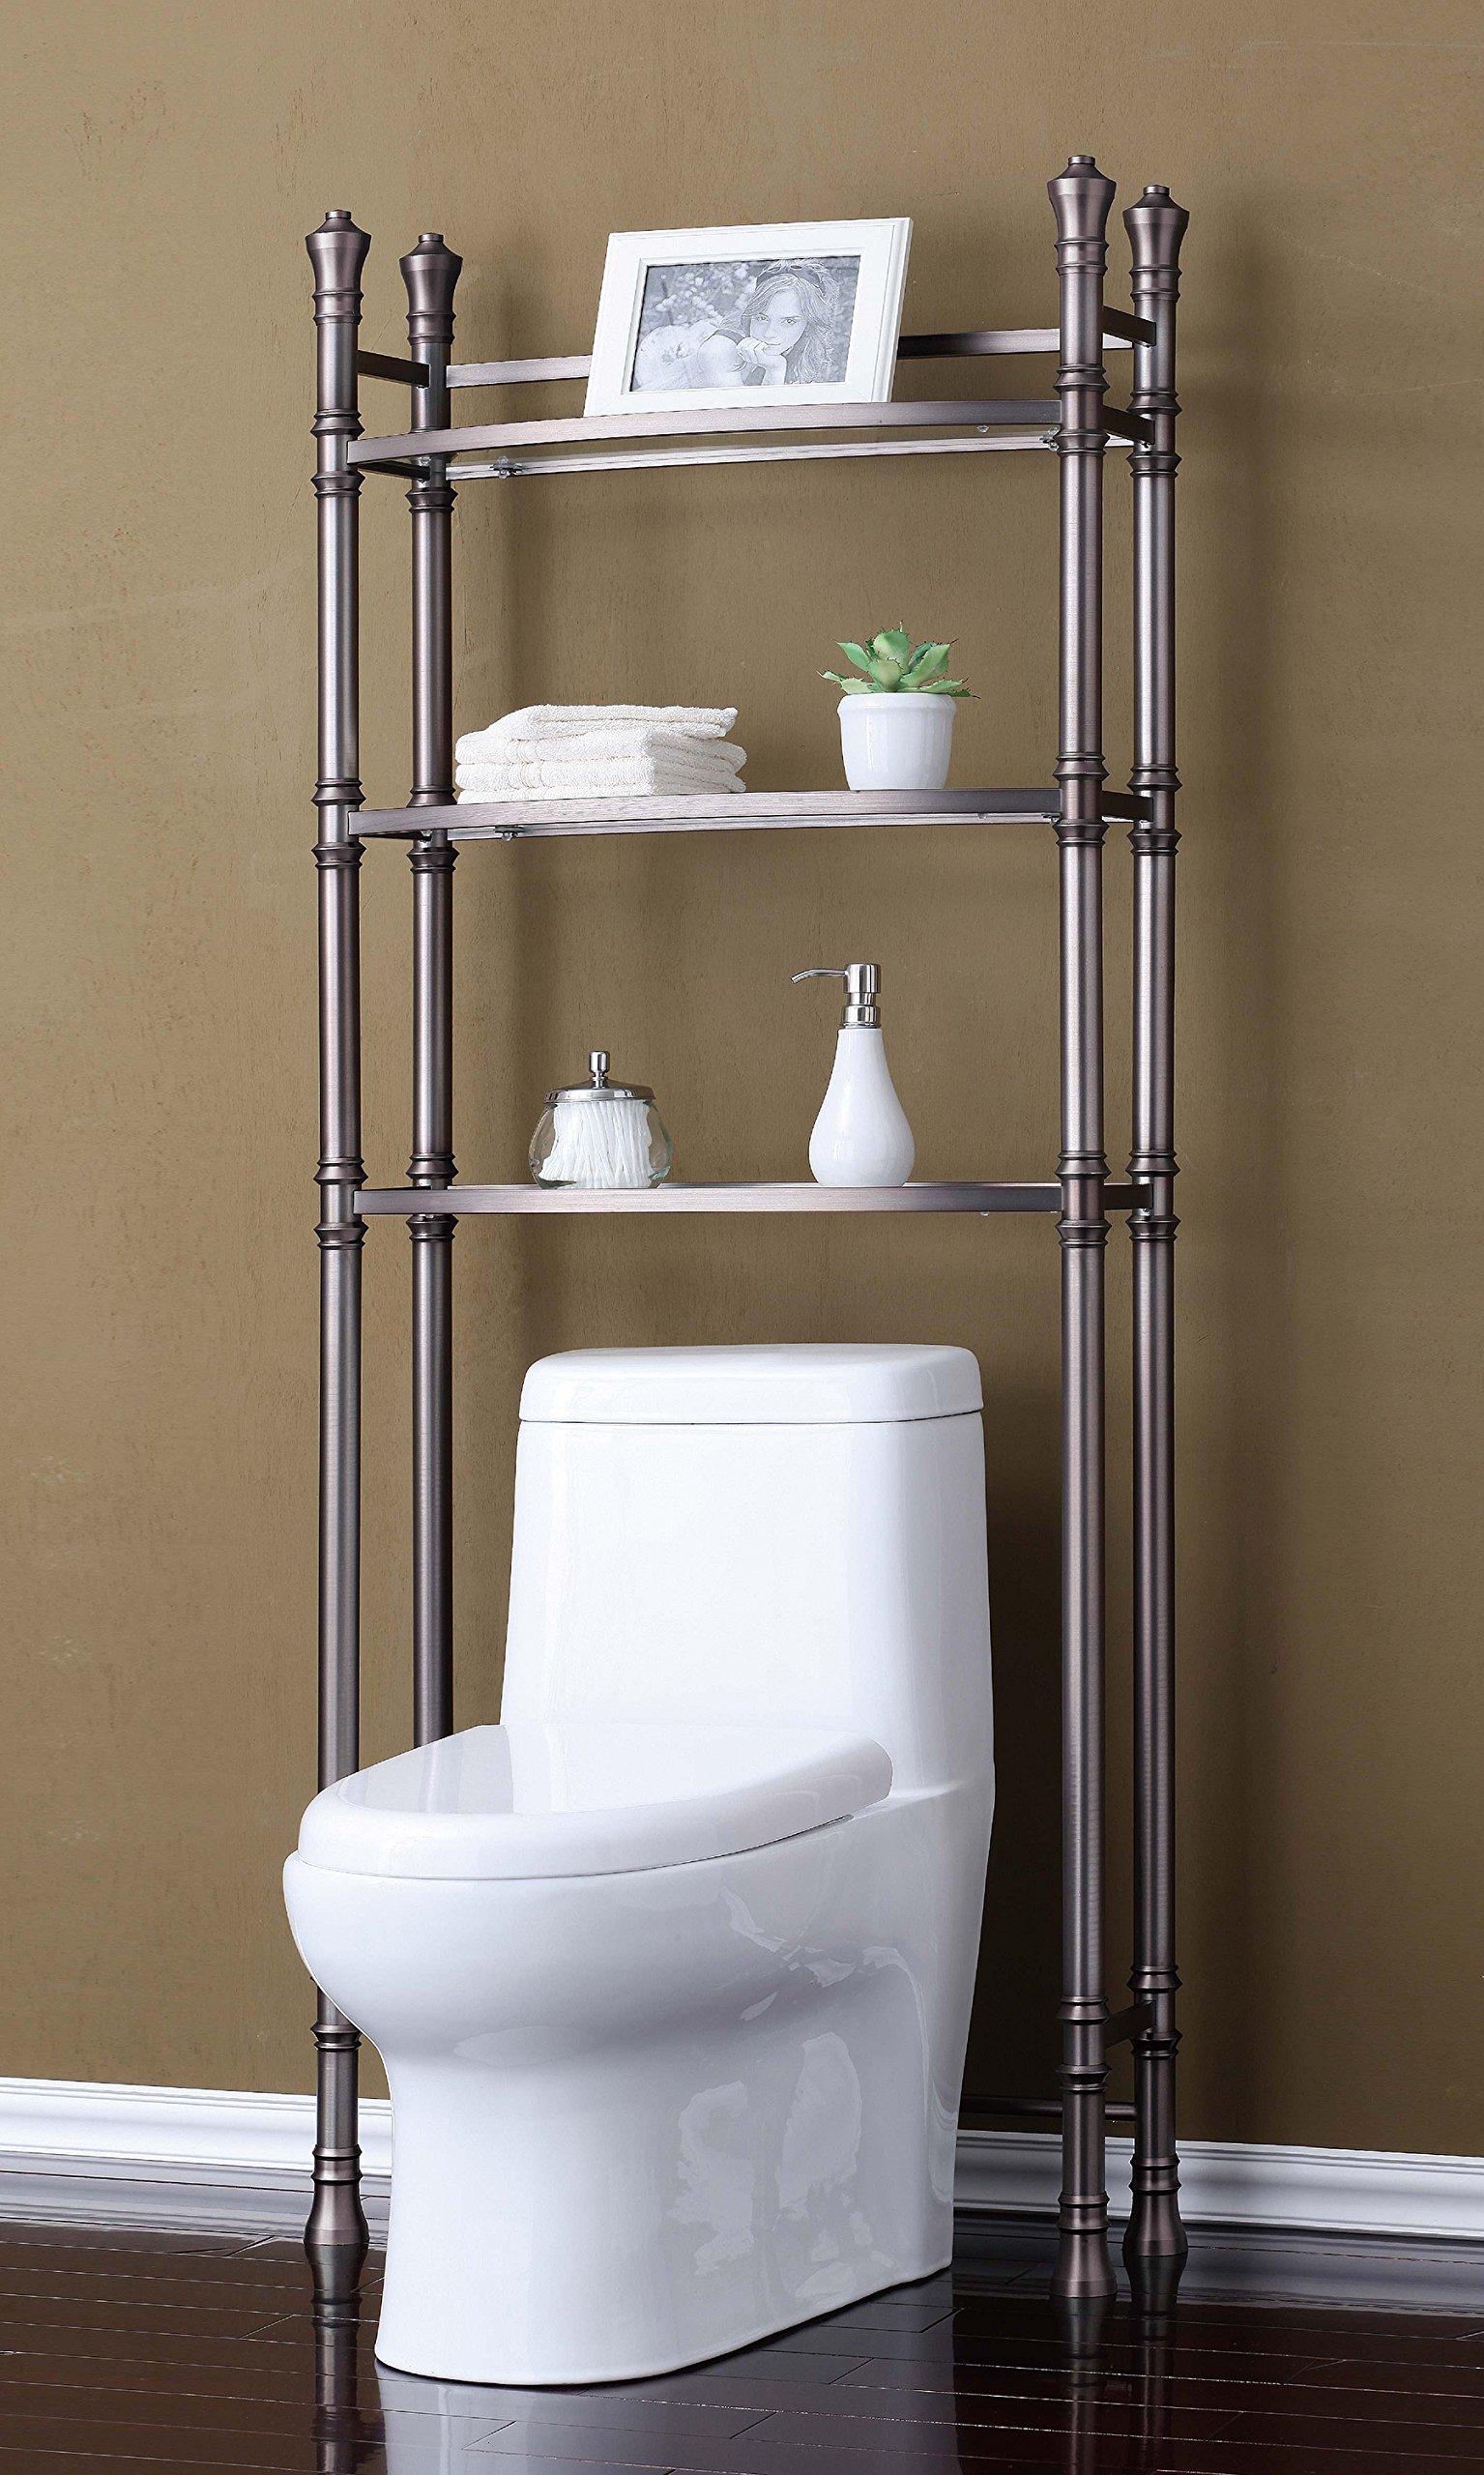 Best Living Monaco Bathroom Space Saver Etagere Shelf, Brushed Titanium